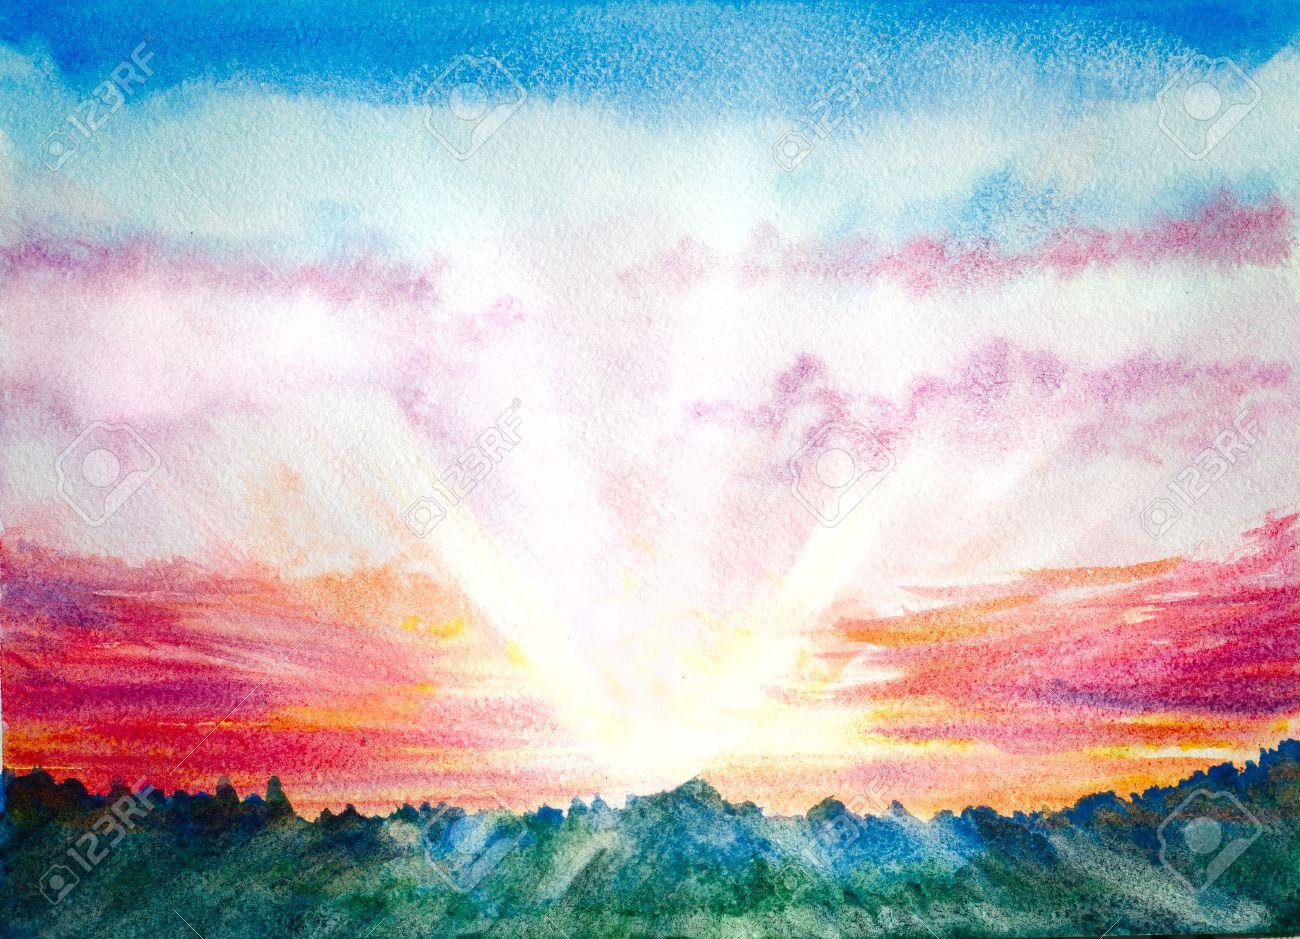 2 840 purple sunrise cliparts stock vector and royalty free purple rh 123rf com Sunrise Over Water Clip Art Cartoon Sunrise Clip Art